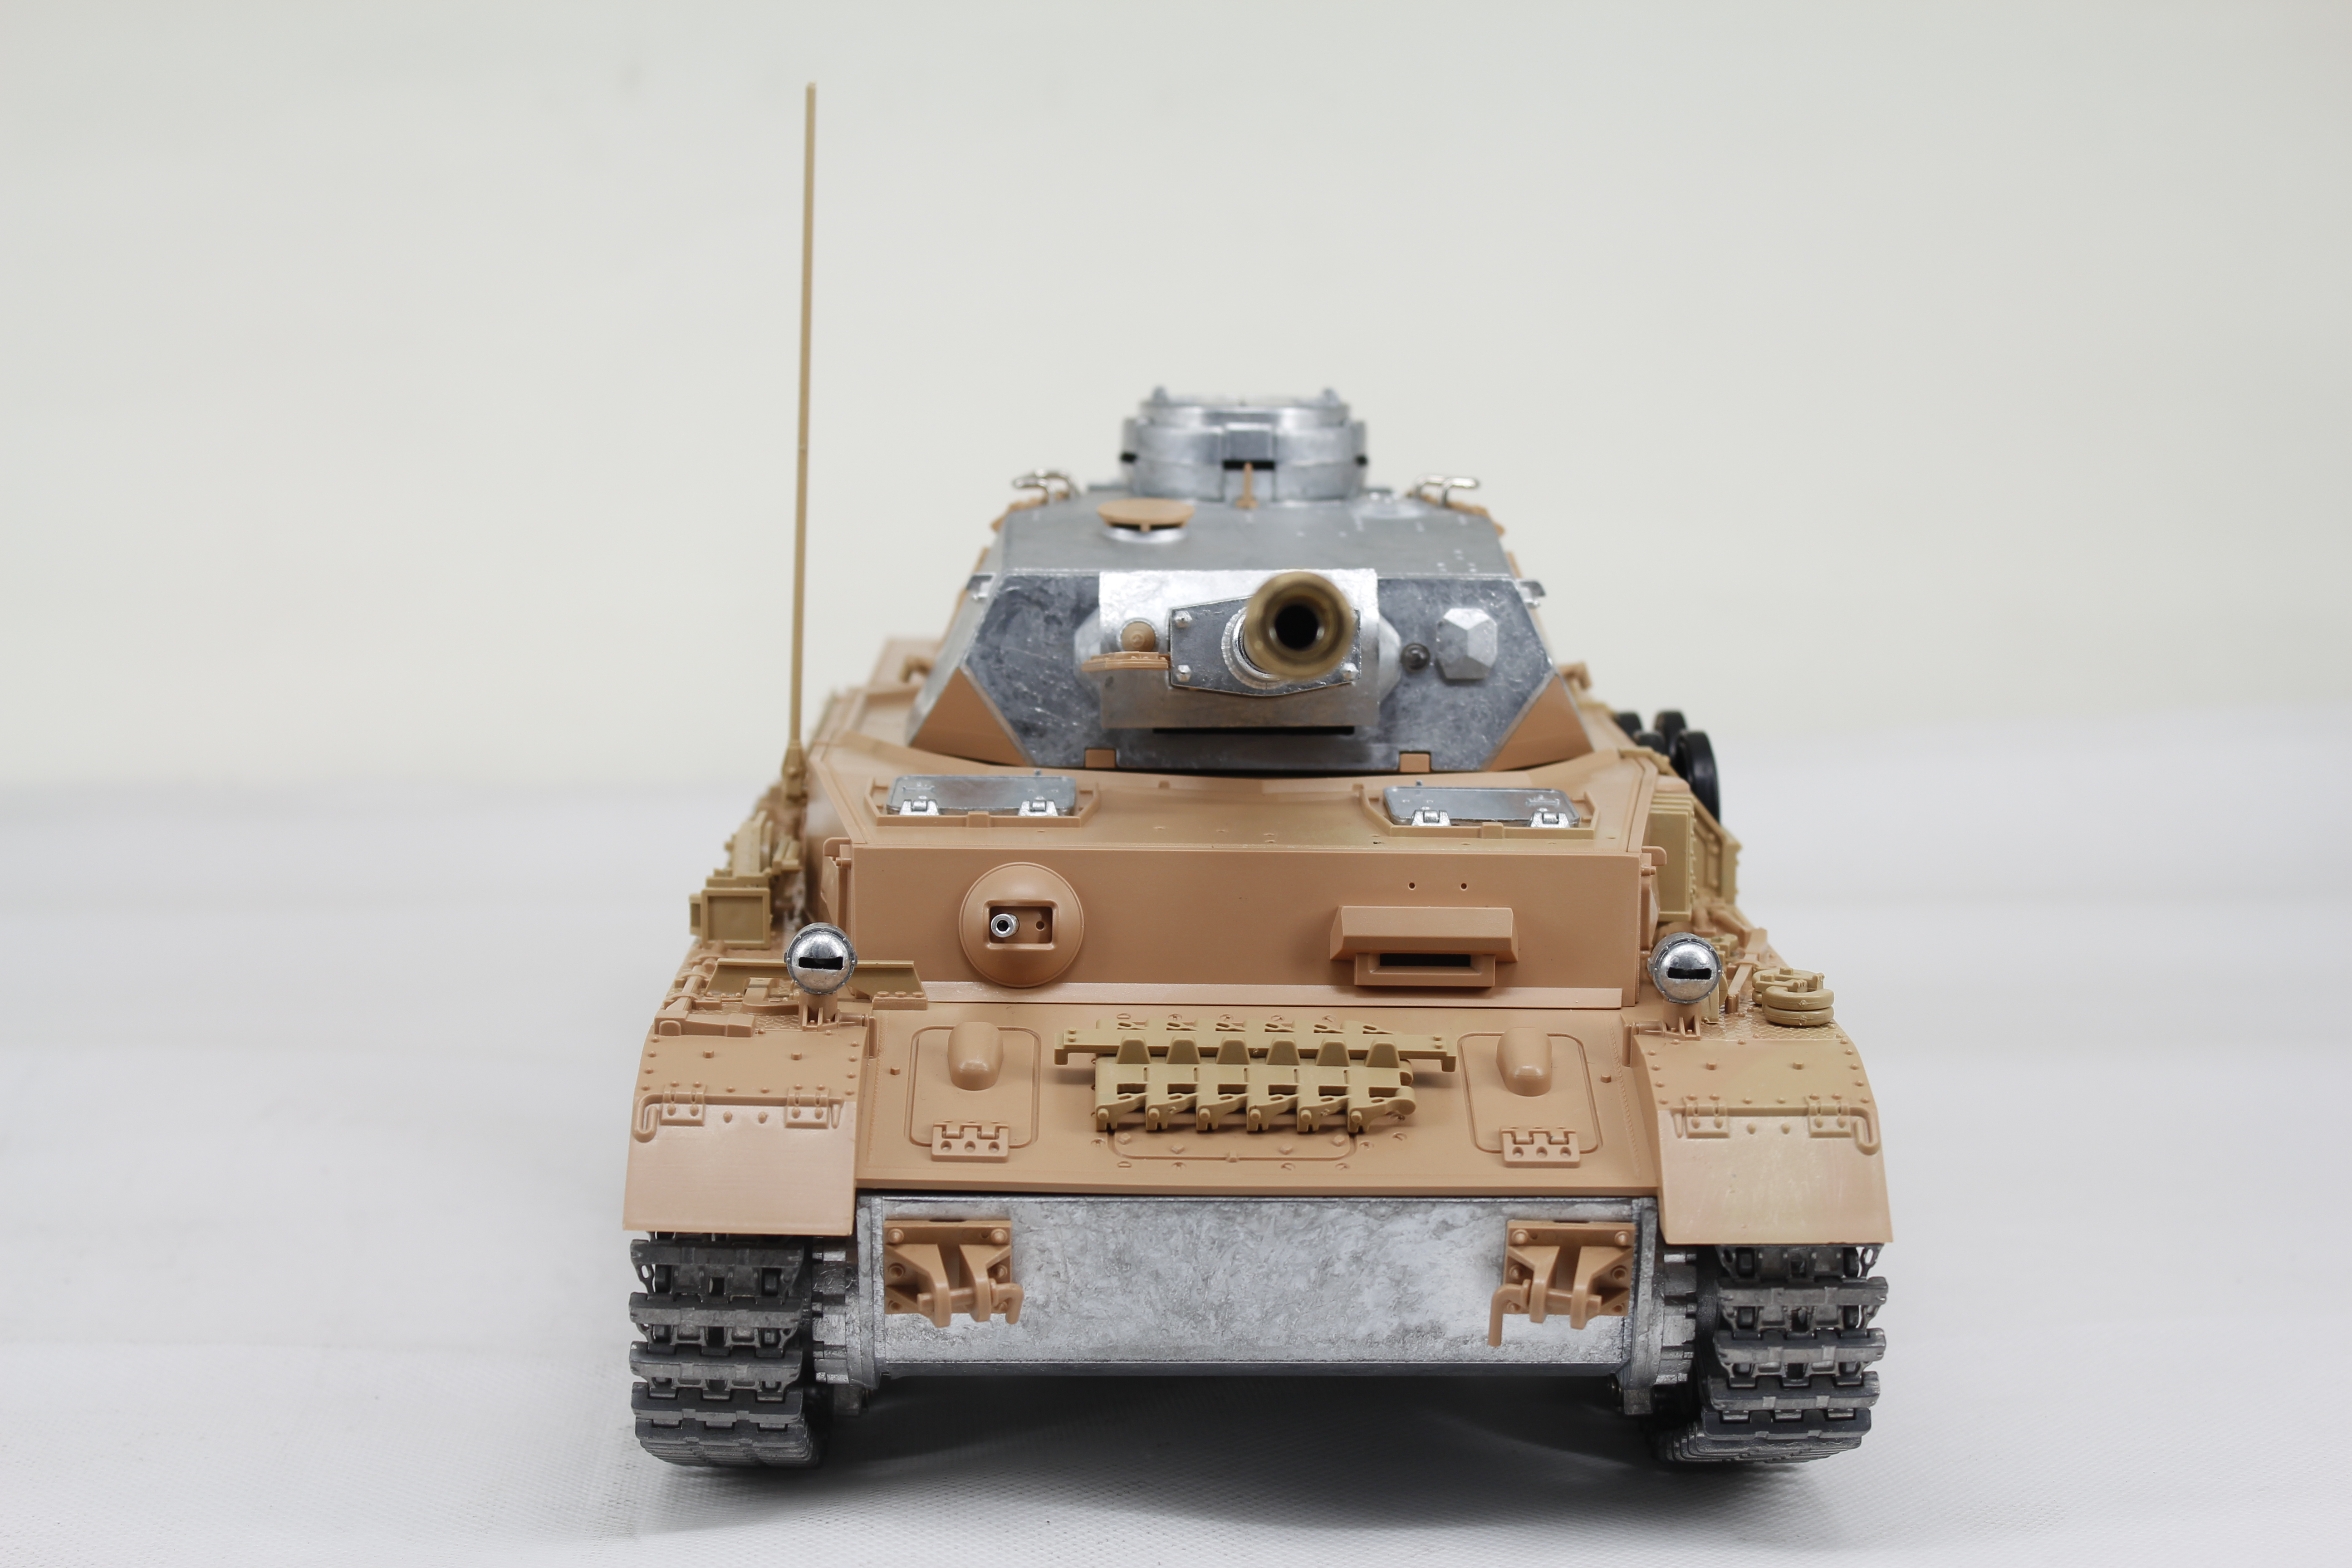 New Taigen PIV F2 Metal Edition Tank! - RCU Forums